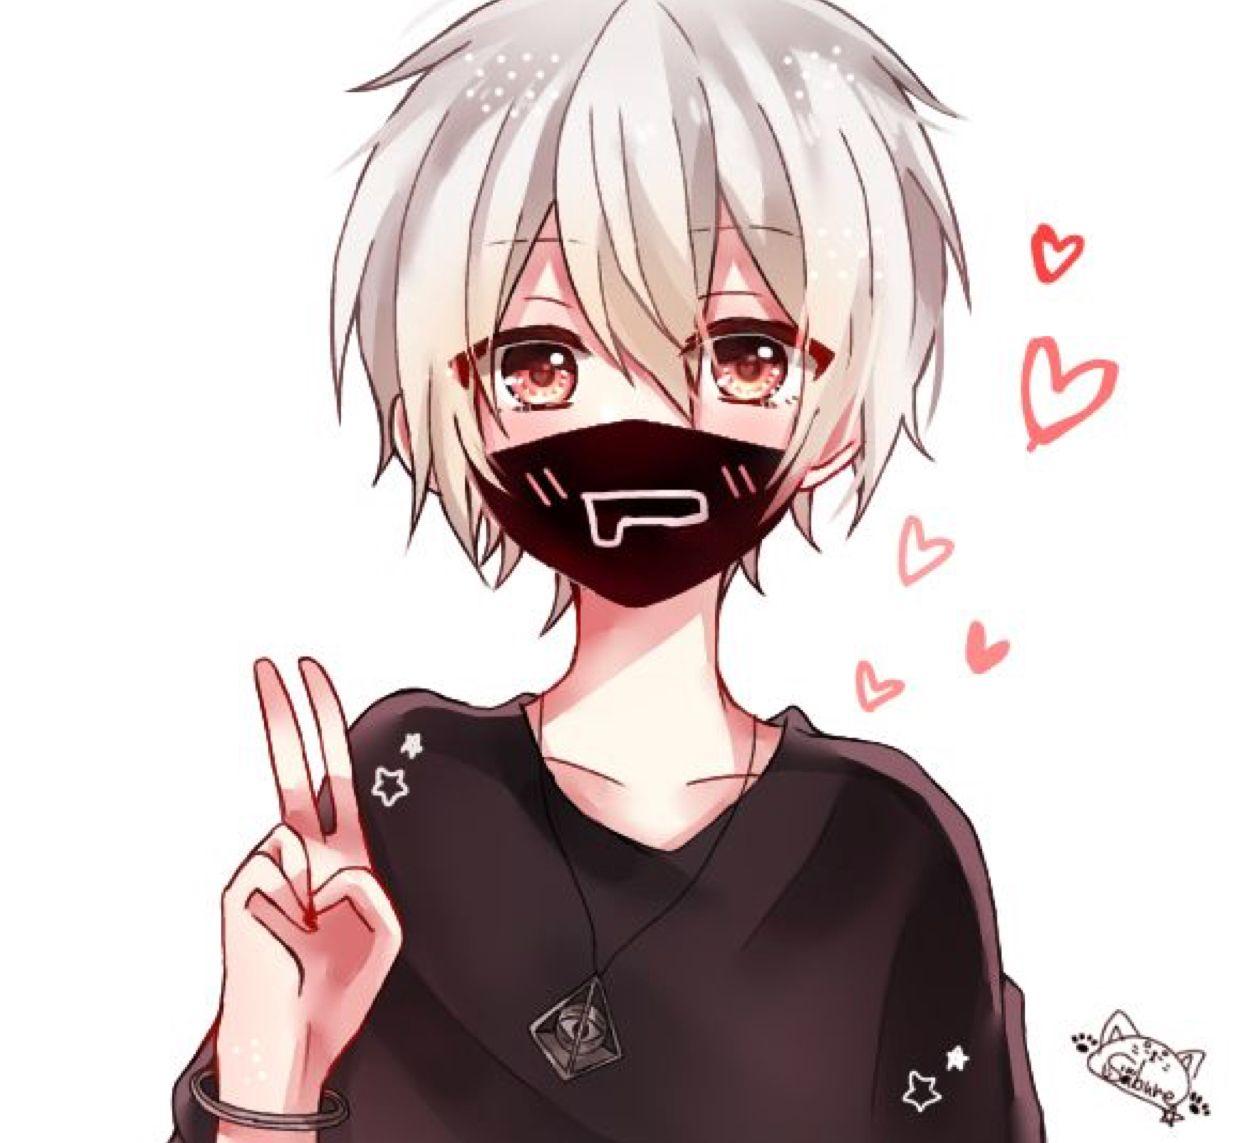 Pin By Anime God On Quick Saves Cute Anime Chibi Cute Anime Guys Kawaii Anime